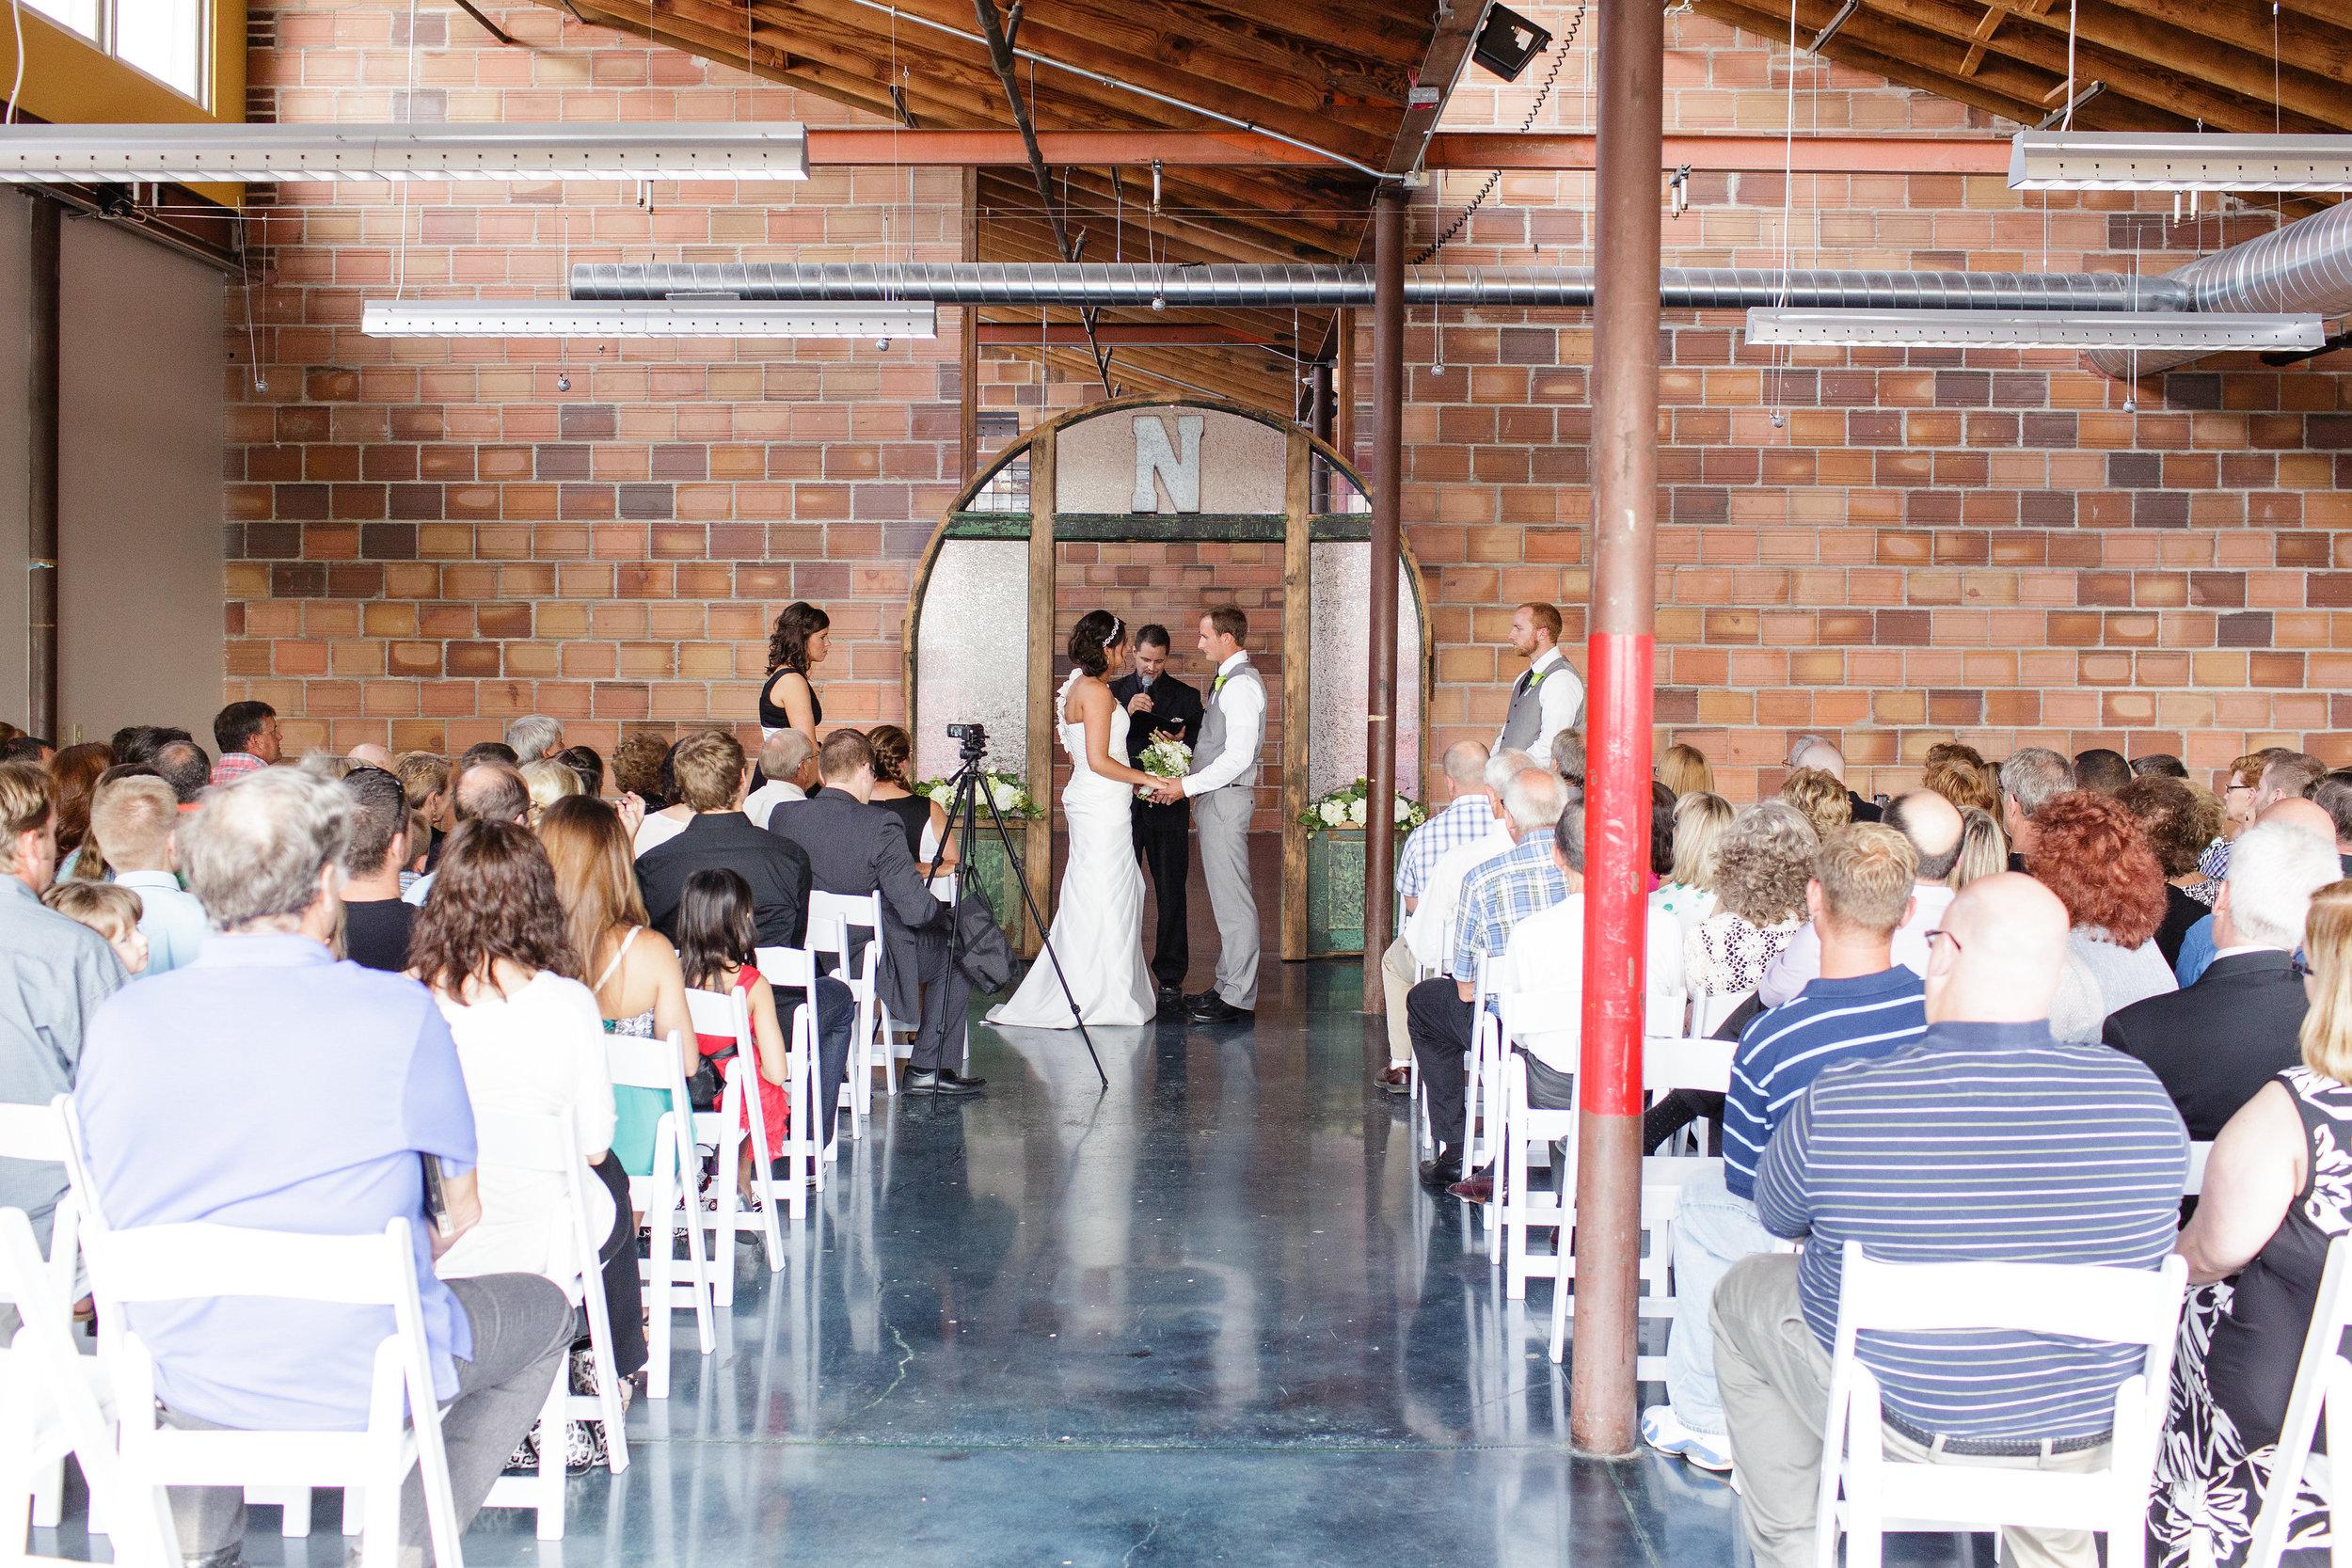 omaha-venue-the-living-room-white-black-downtown-wedding-ceremony-brick-urban-loft